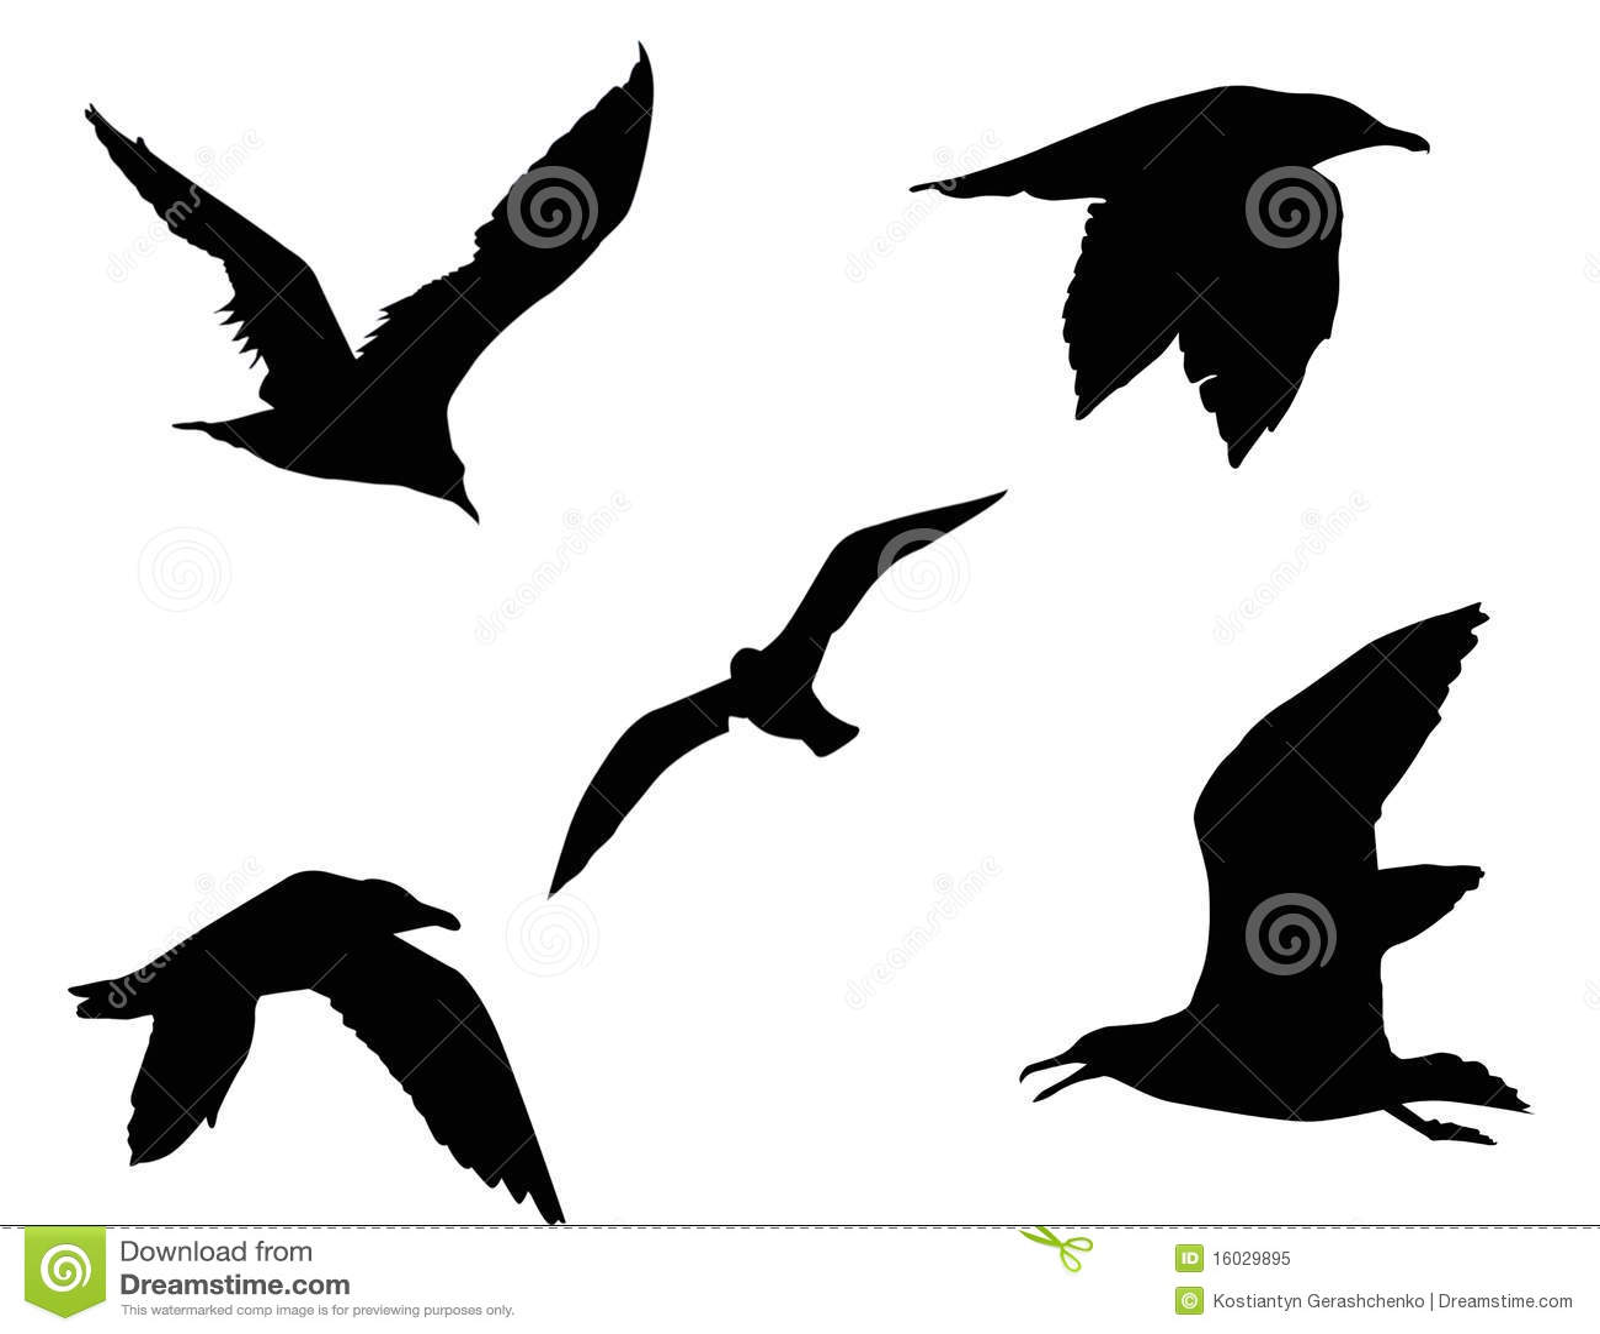 Silhouette Of A Bird Stock Illustration. Illustration Of